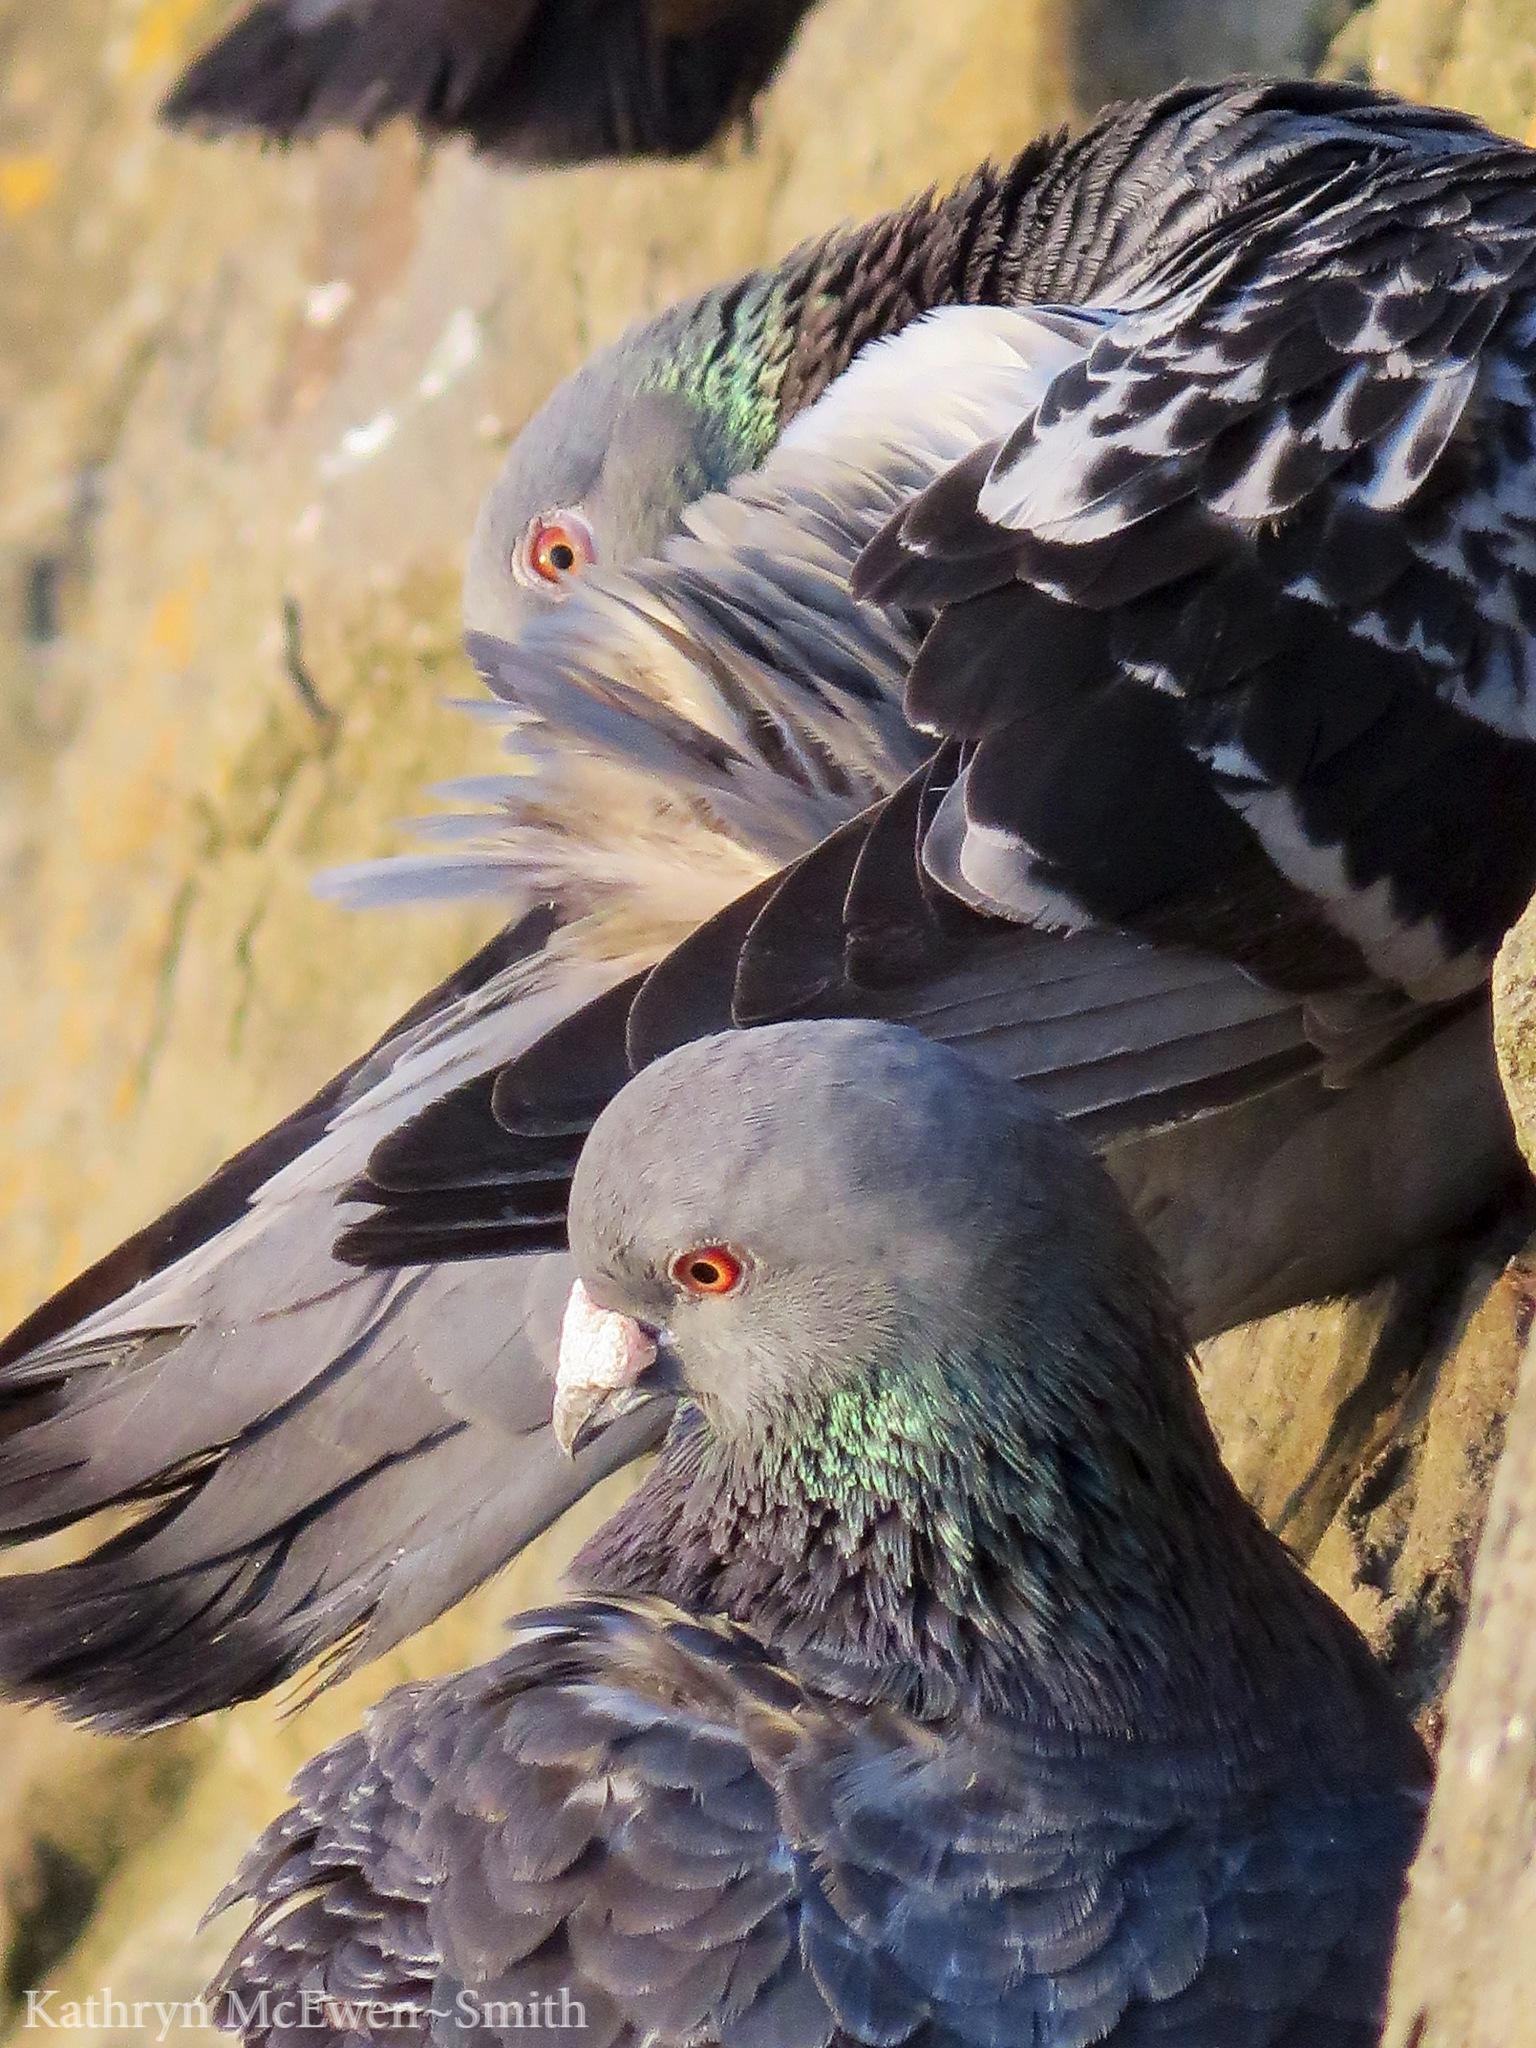 Pigeons preening by Kathryn McEwen-Smith